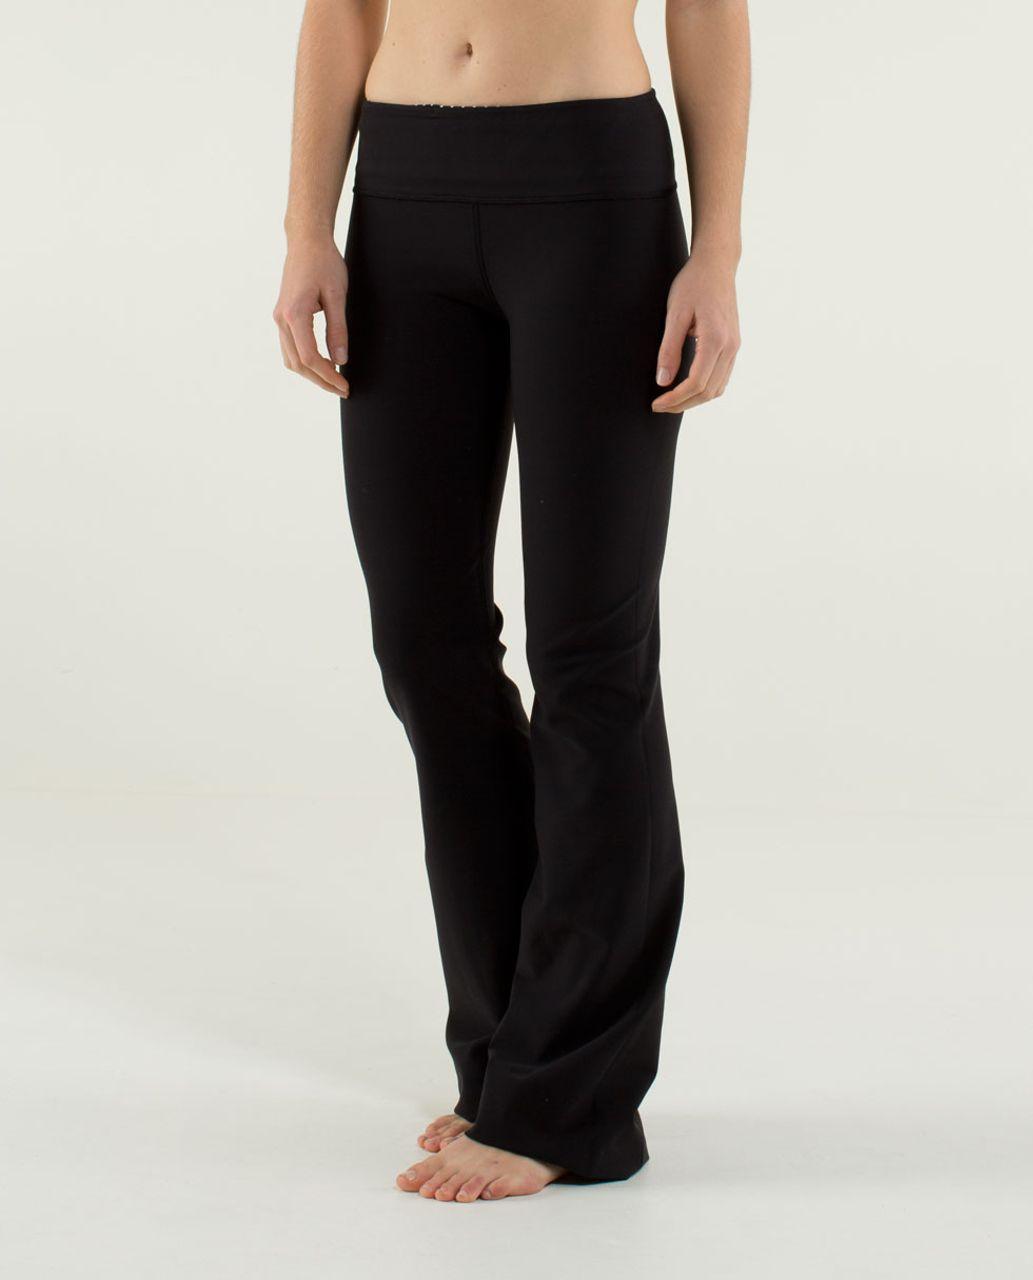 Lululemon Groove Pant (Tall) *Full-On Luon - Black / Quilt Winter 13-13